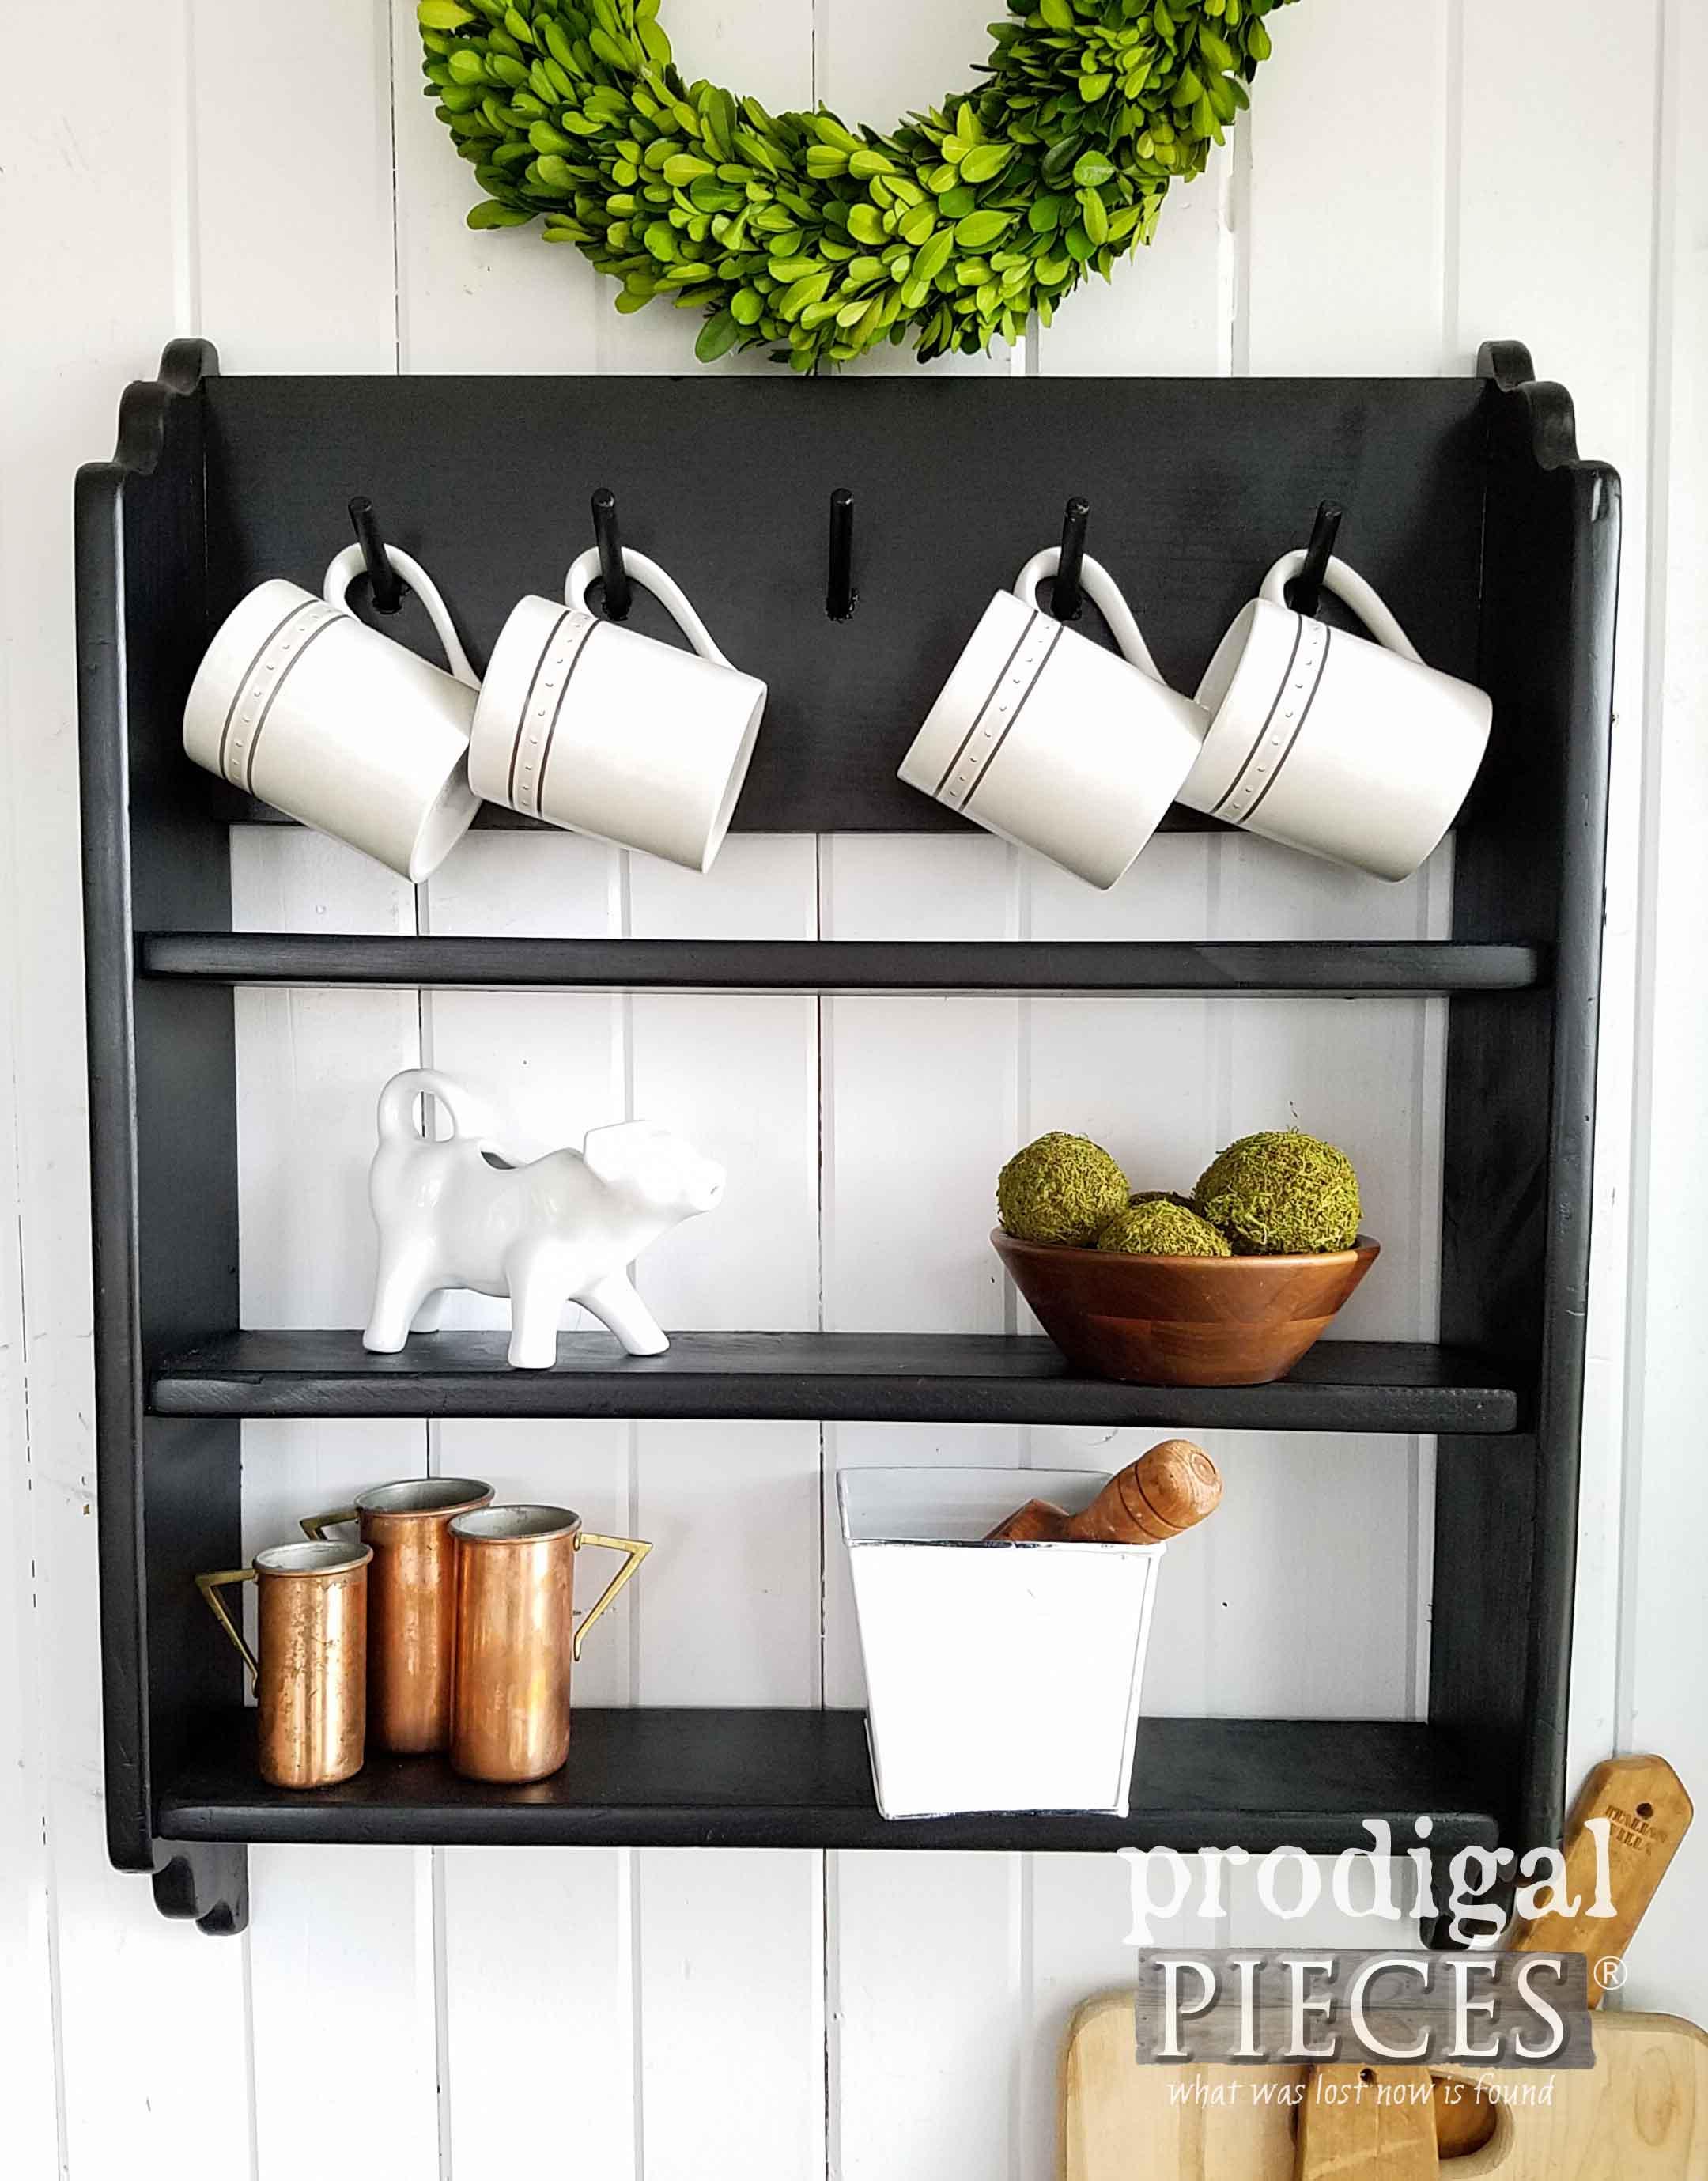 Modern Farmhouse Shelf in Black with Mug Rack by Larissa of Prodigal Pieces | prodigalpieces.com